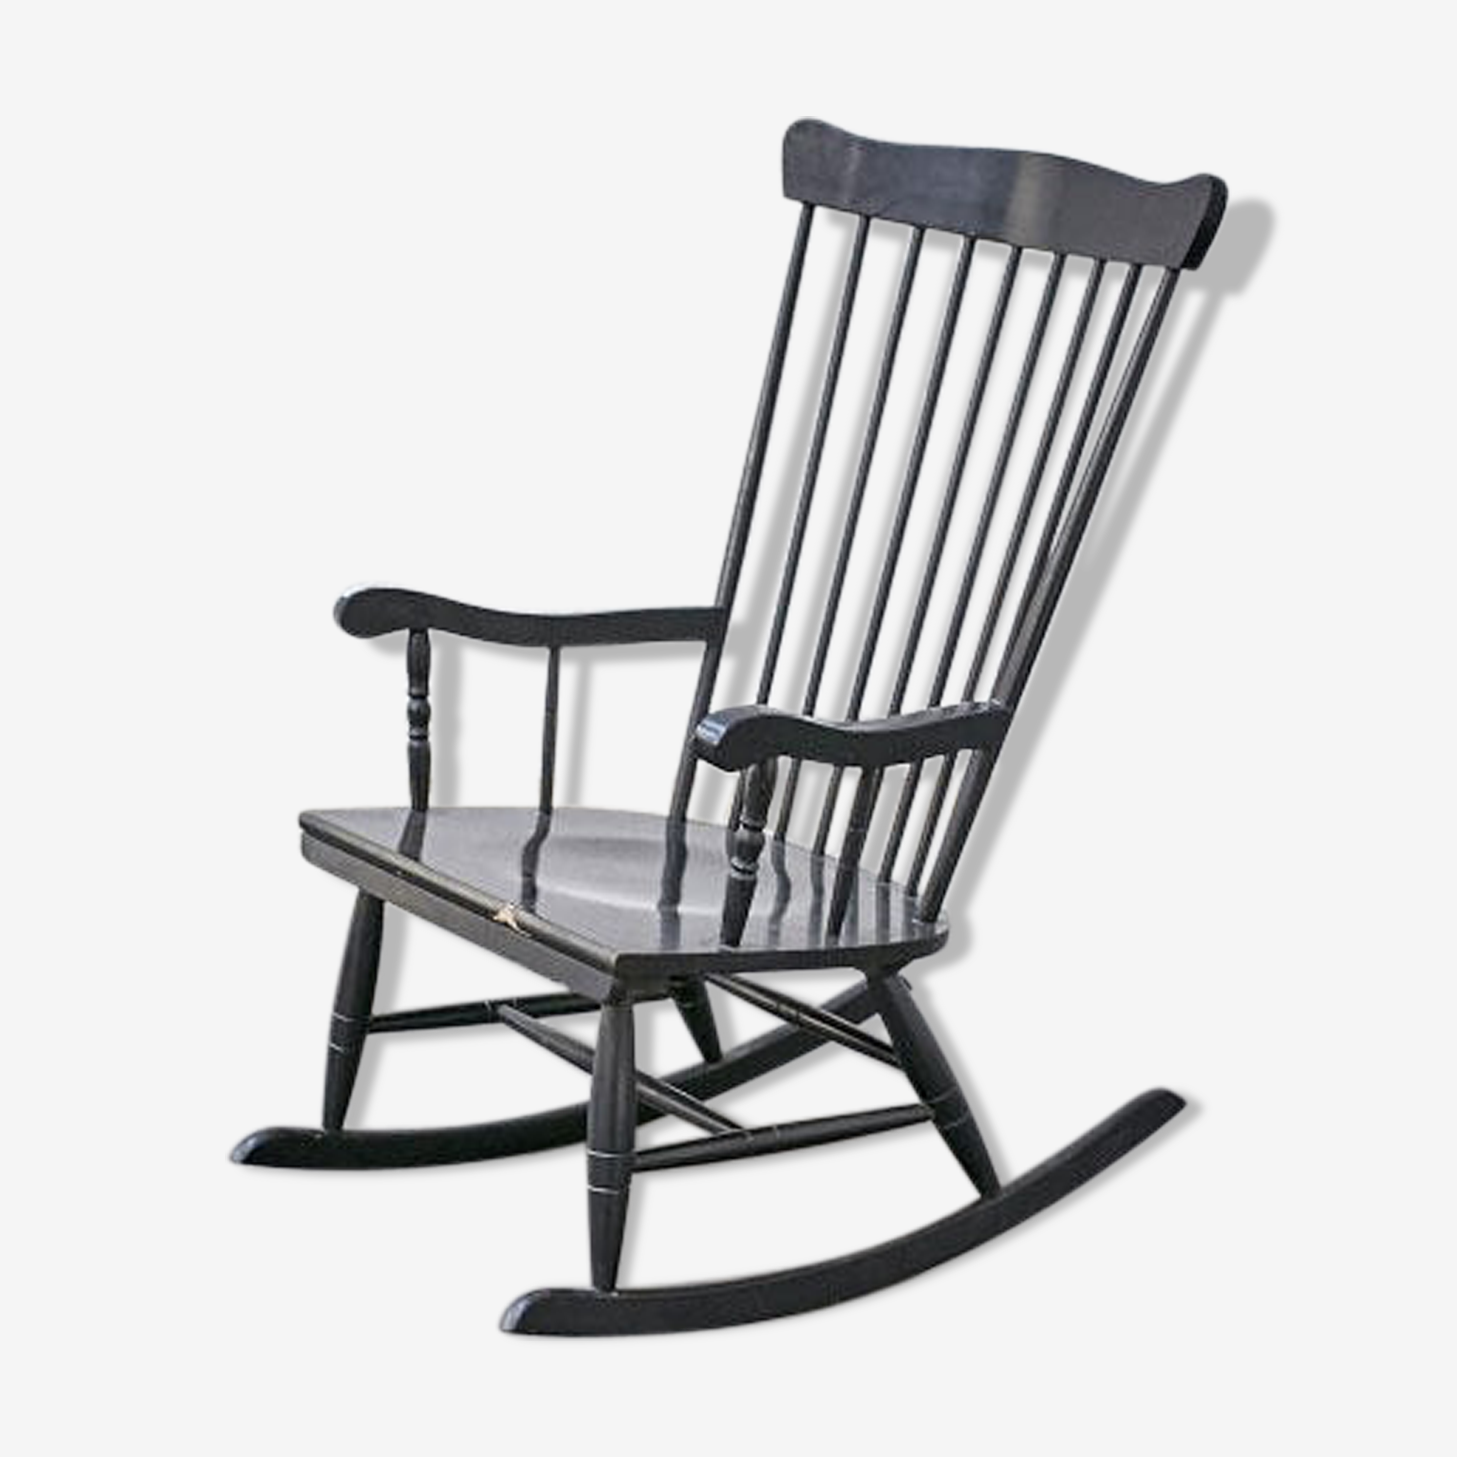 Rocking chair en bois peint